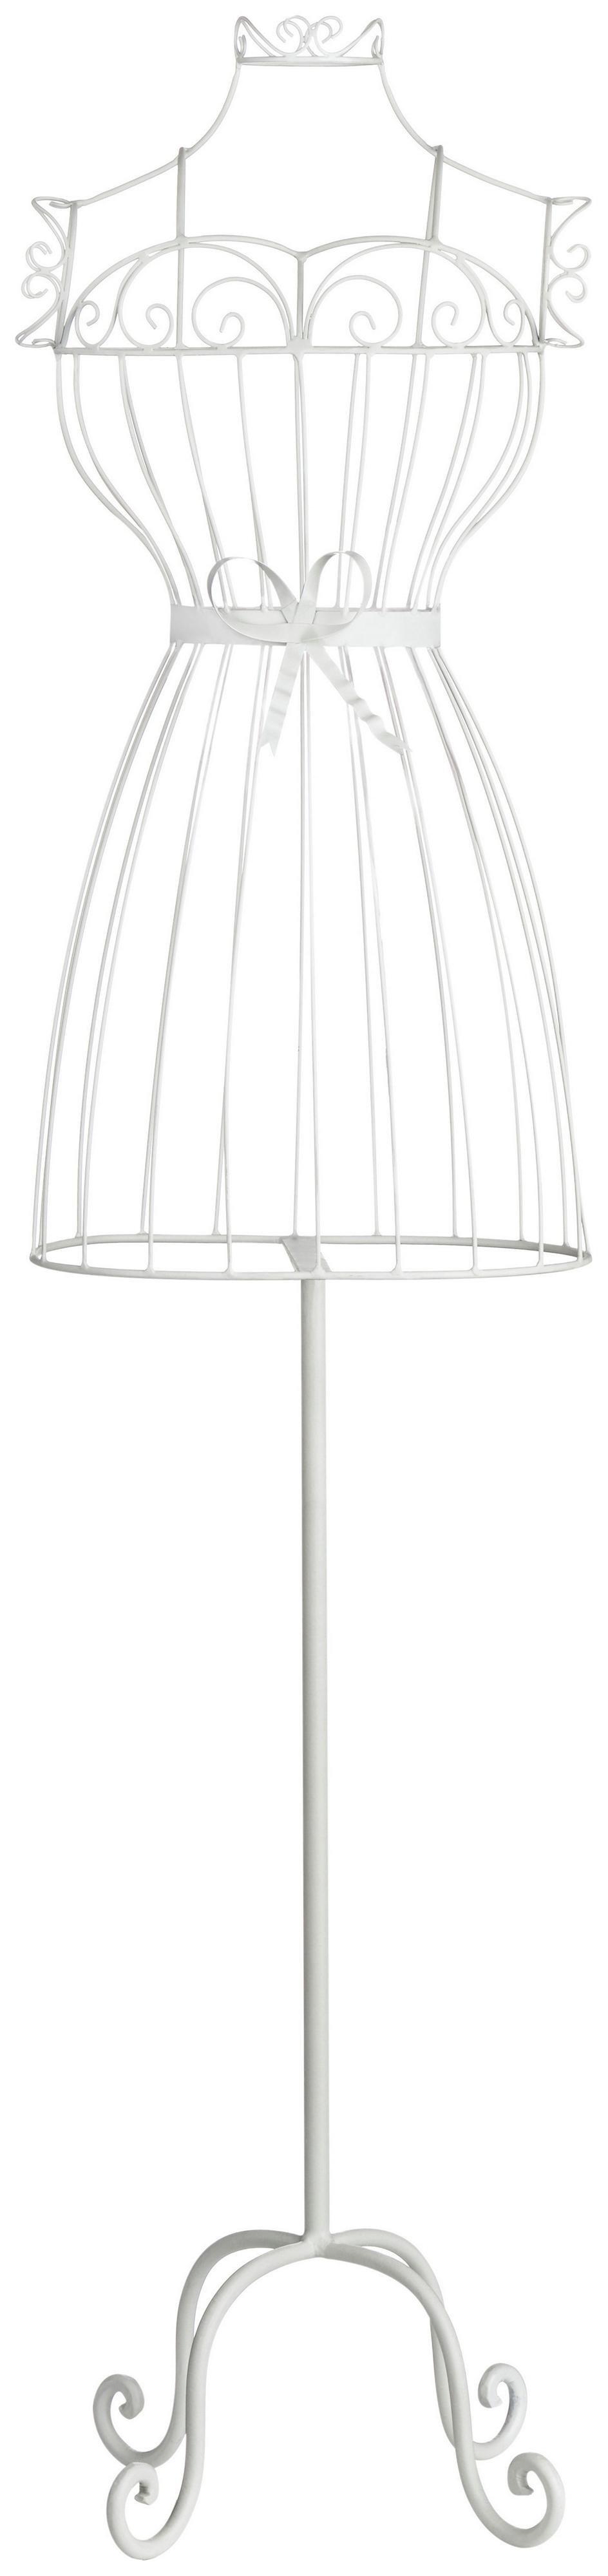 Premier Housewares Chic Annabelle Mannequin - White. lowest price